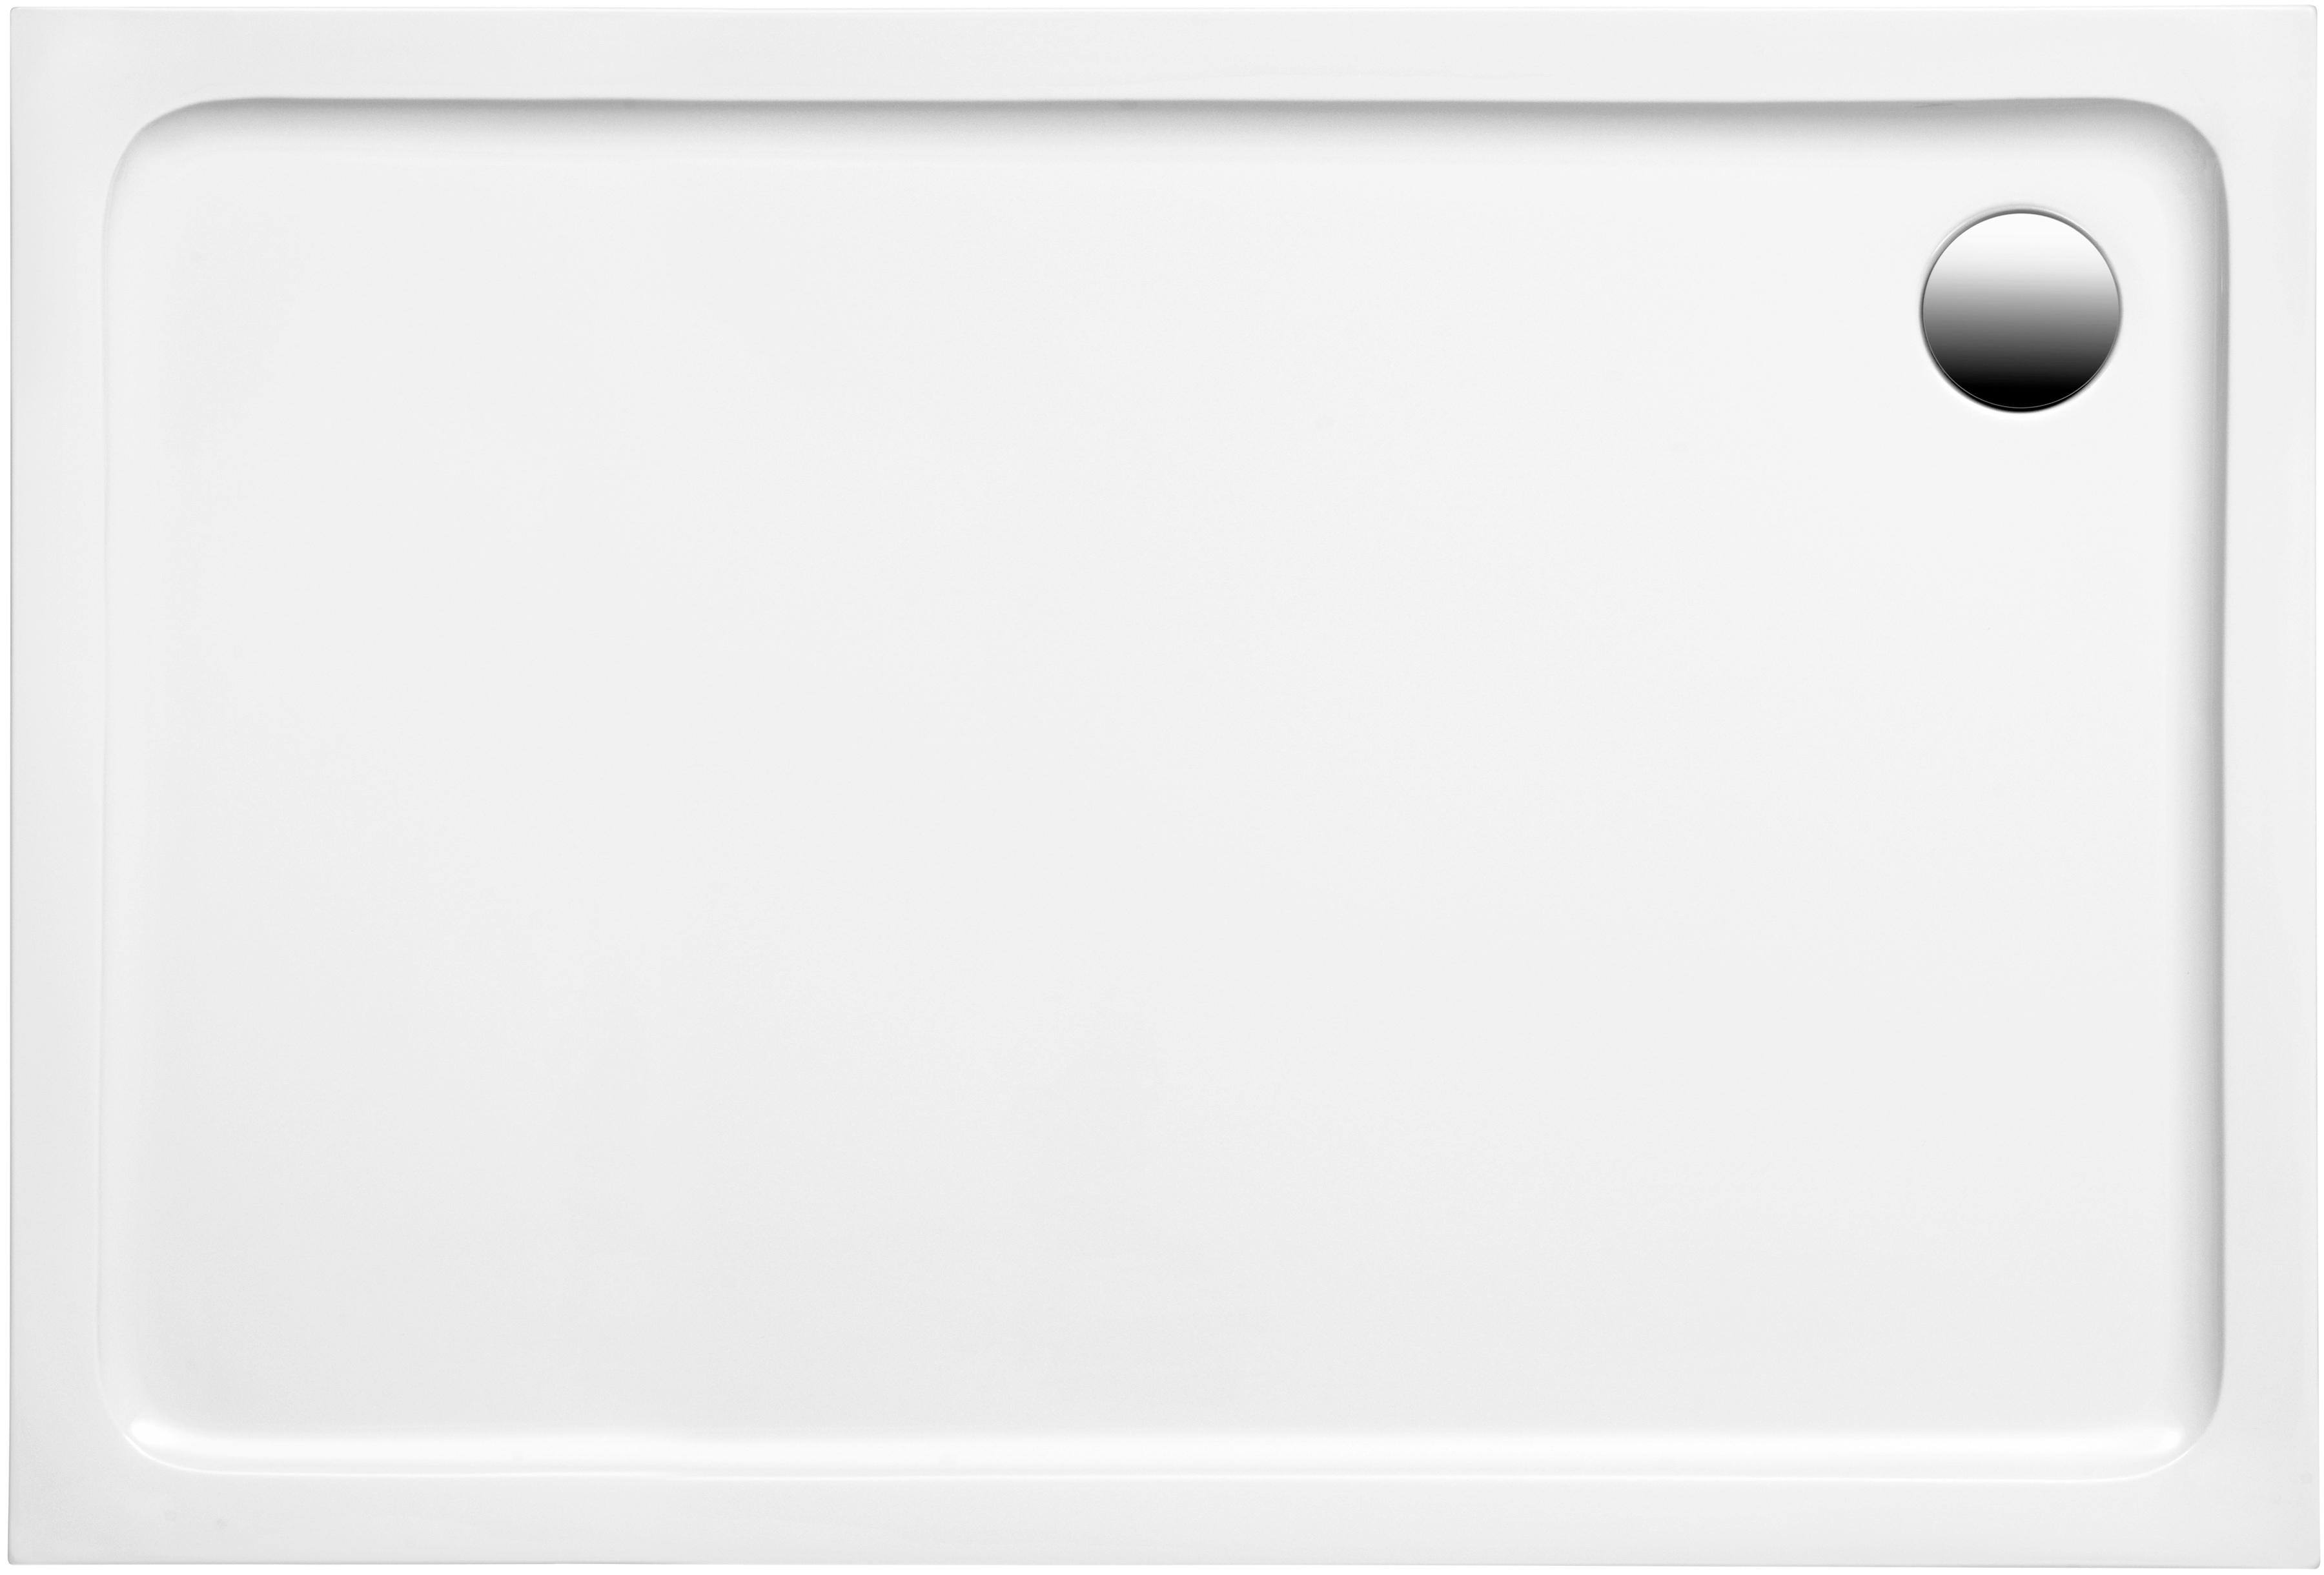 OTTOFOND Duschwanne Set Rechteckduschwanne, 900x750/30 mm weiß Duschwannen Duschen Bad Sanitär